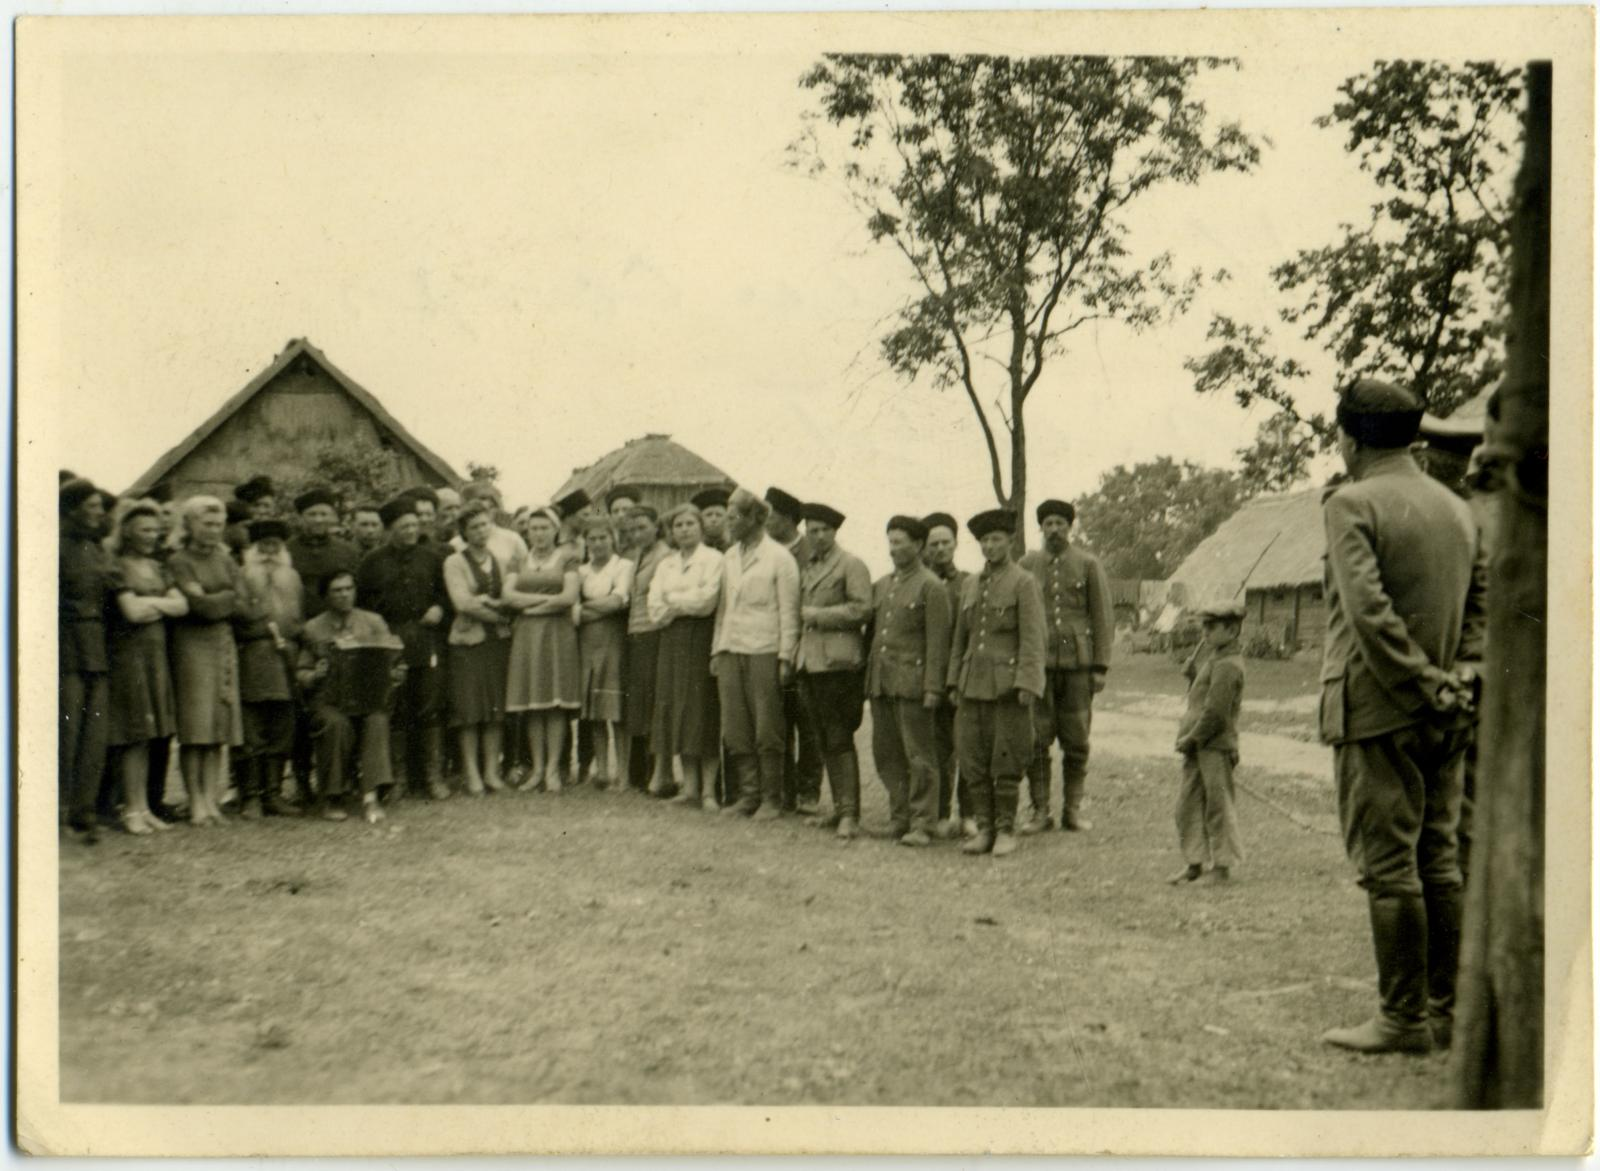 Казачий стан. Район Барановичи — Слоним. 1944.